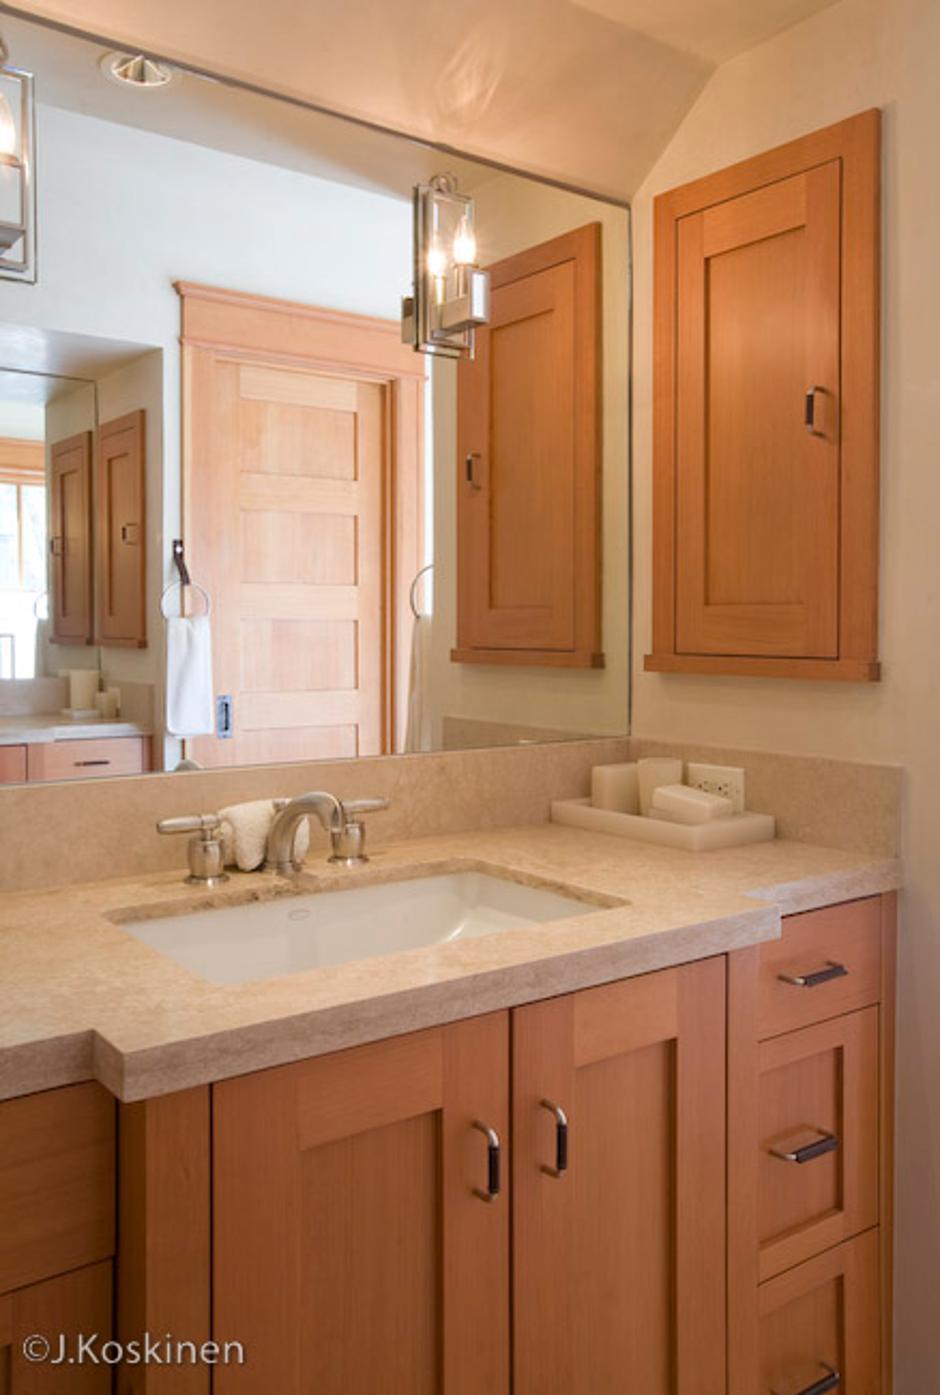 154 Bathroom - Kitchen in Southwest Colorado